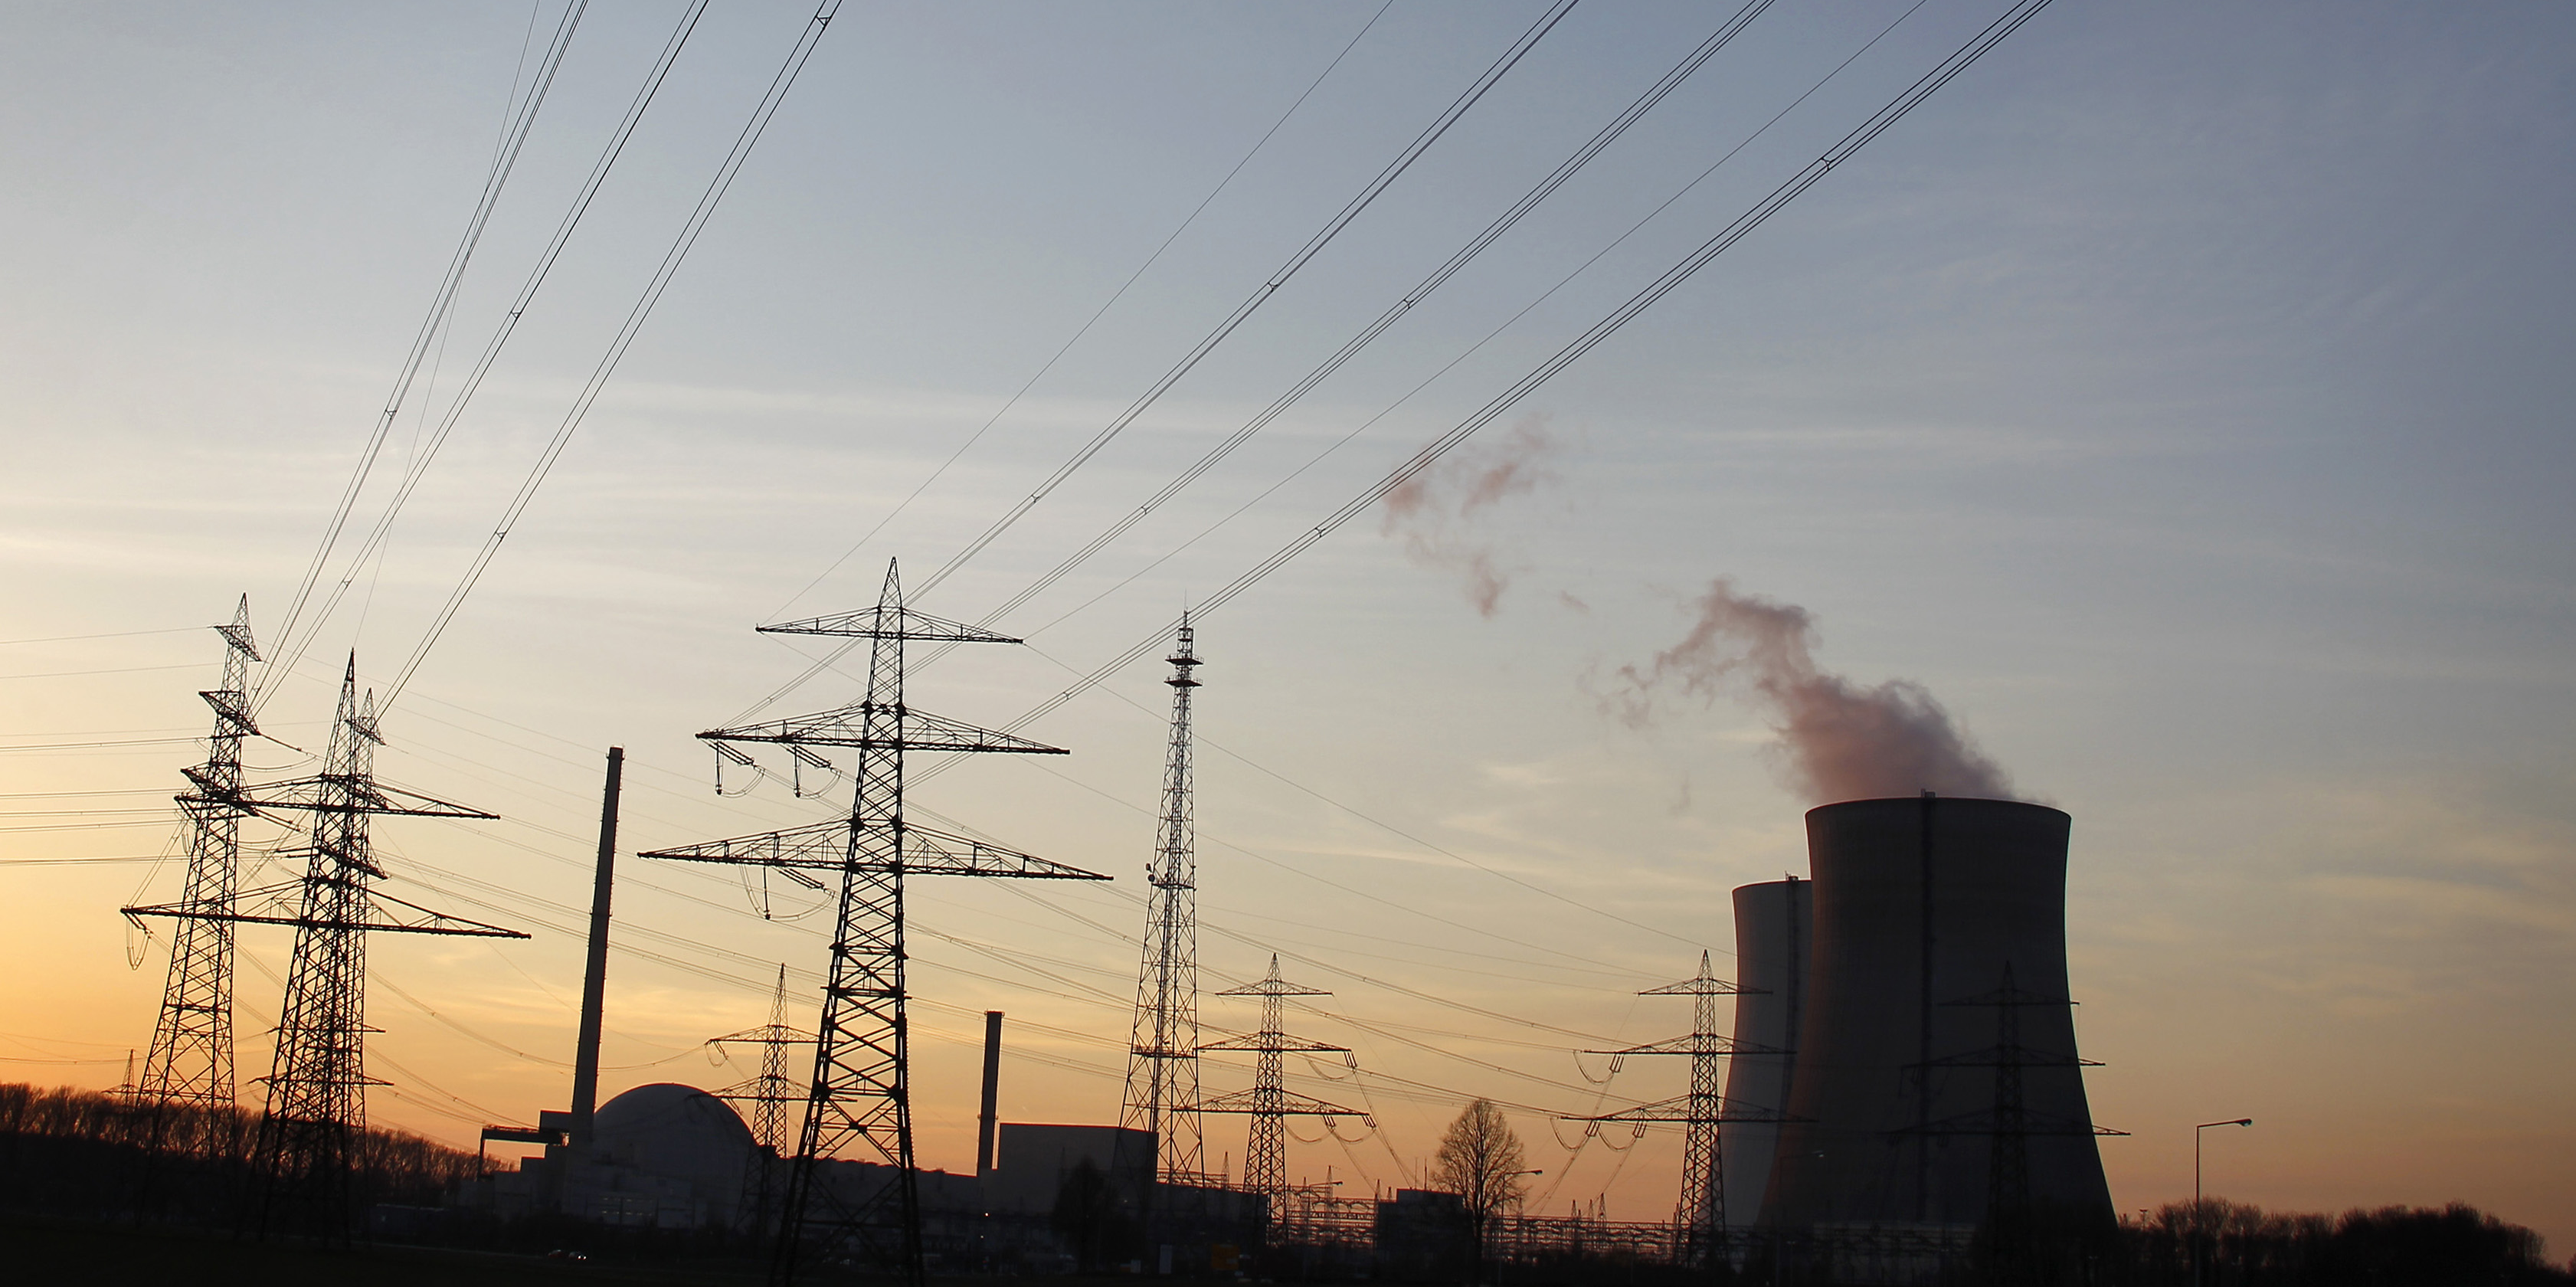 Le Kenyaaura sa Centrale d'énergie nucléaire d'ici 2027